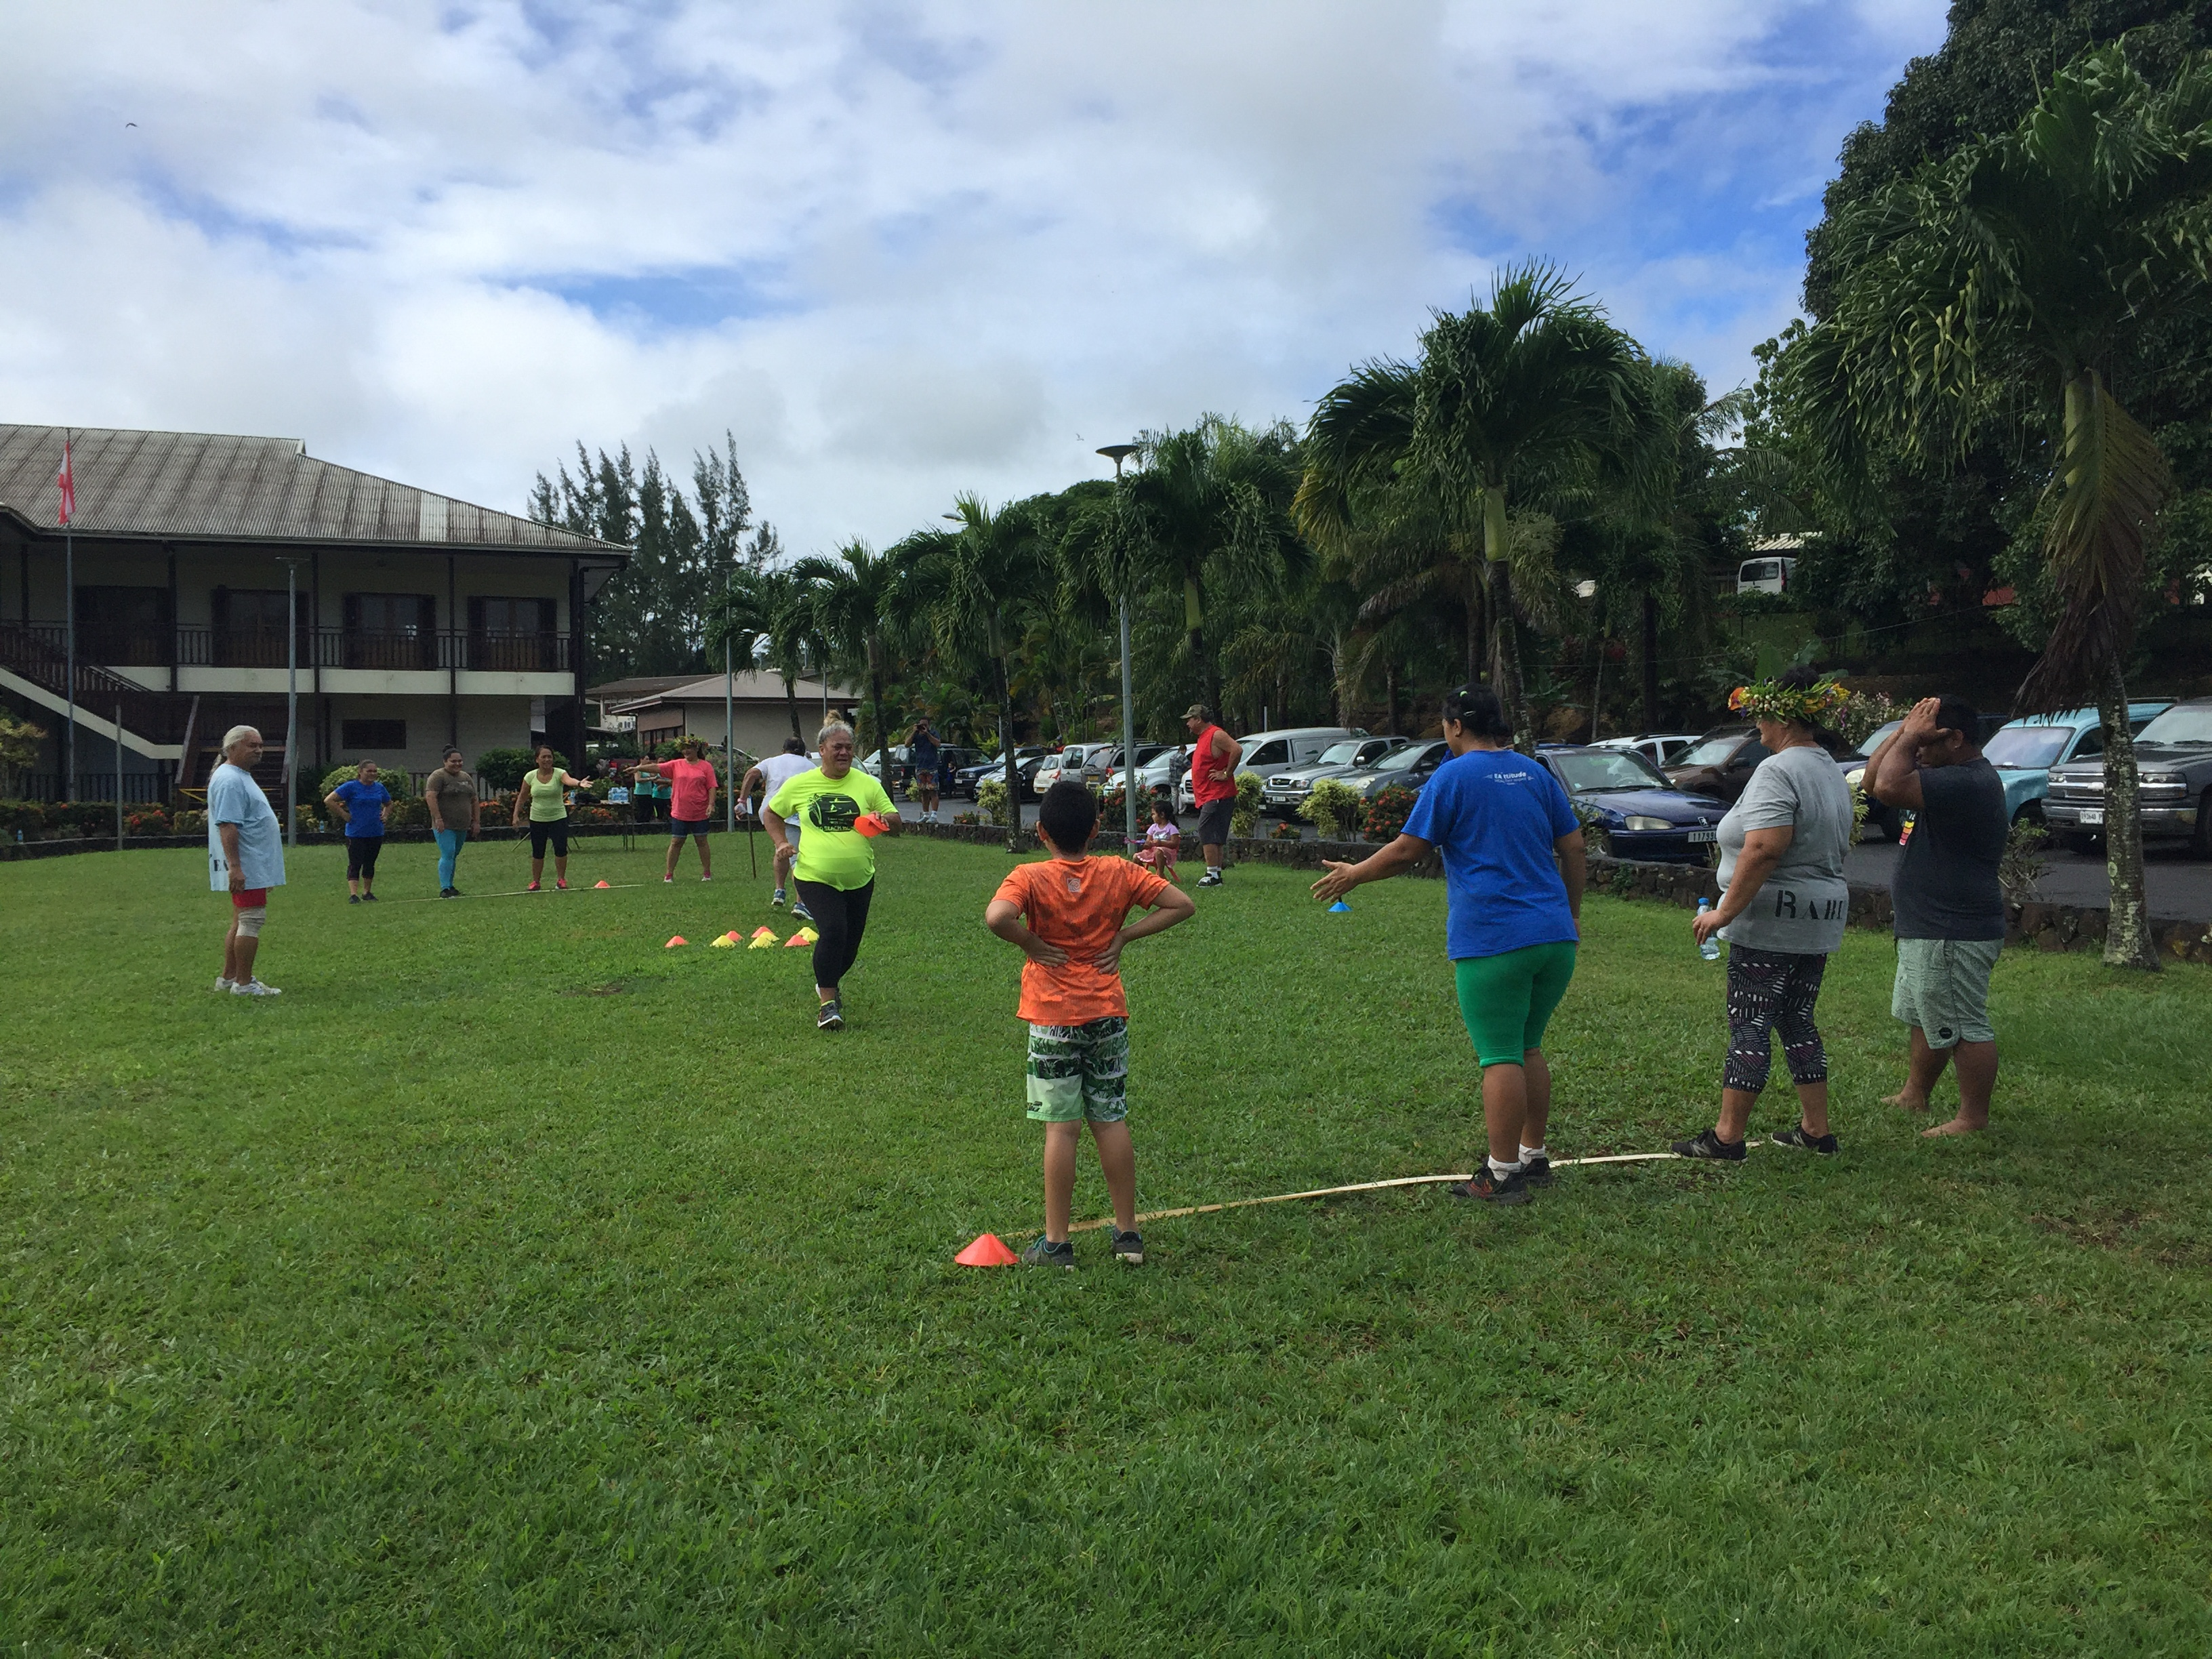 La première rencontre sportive de l'association a eu lieu samedi 6 juillet dans les jardins de la Mairie de Taravao. Crédit Rahu'ea.